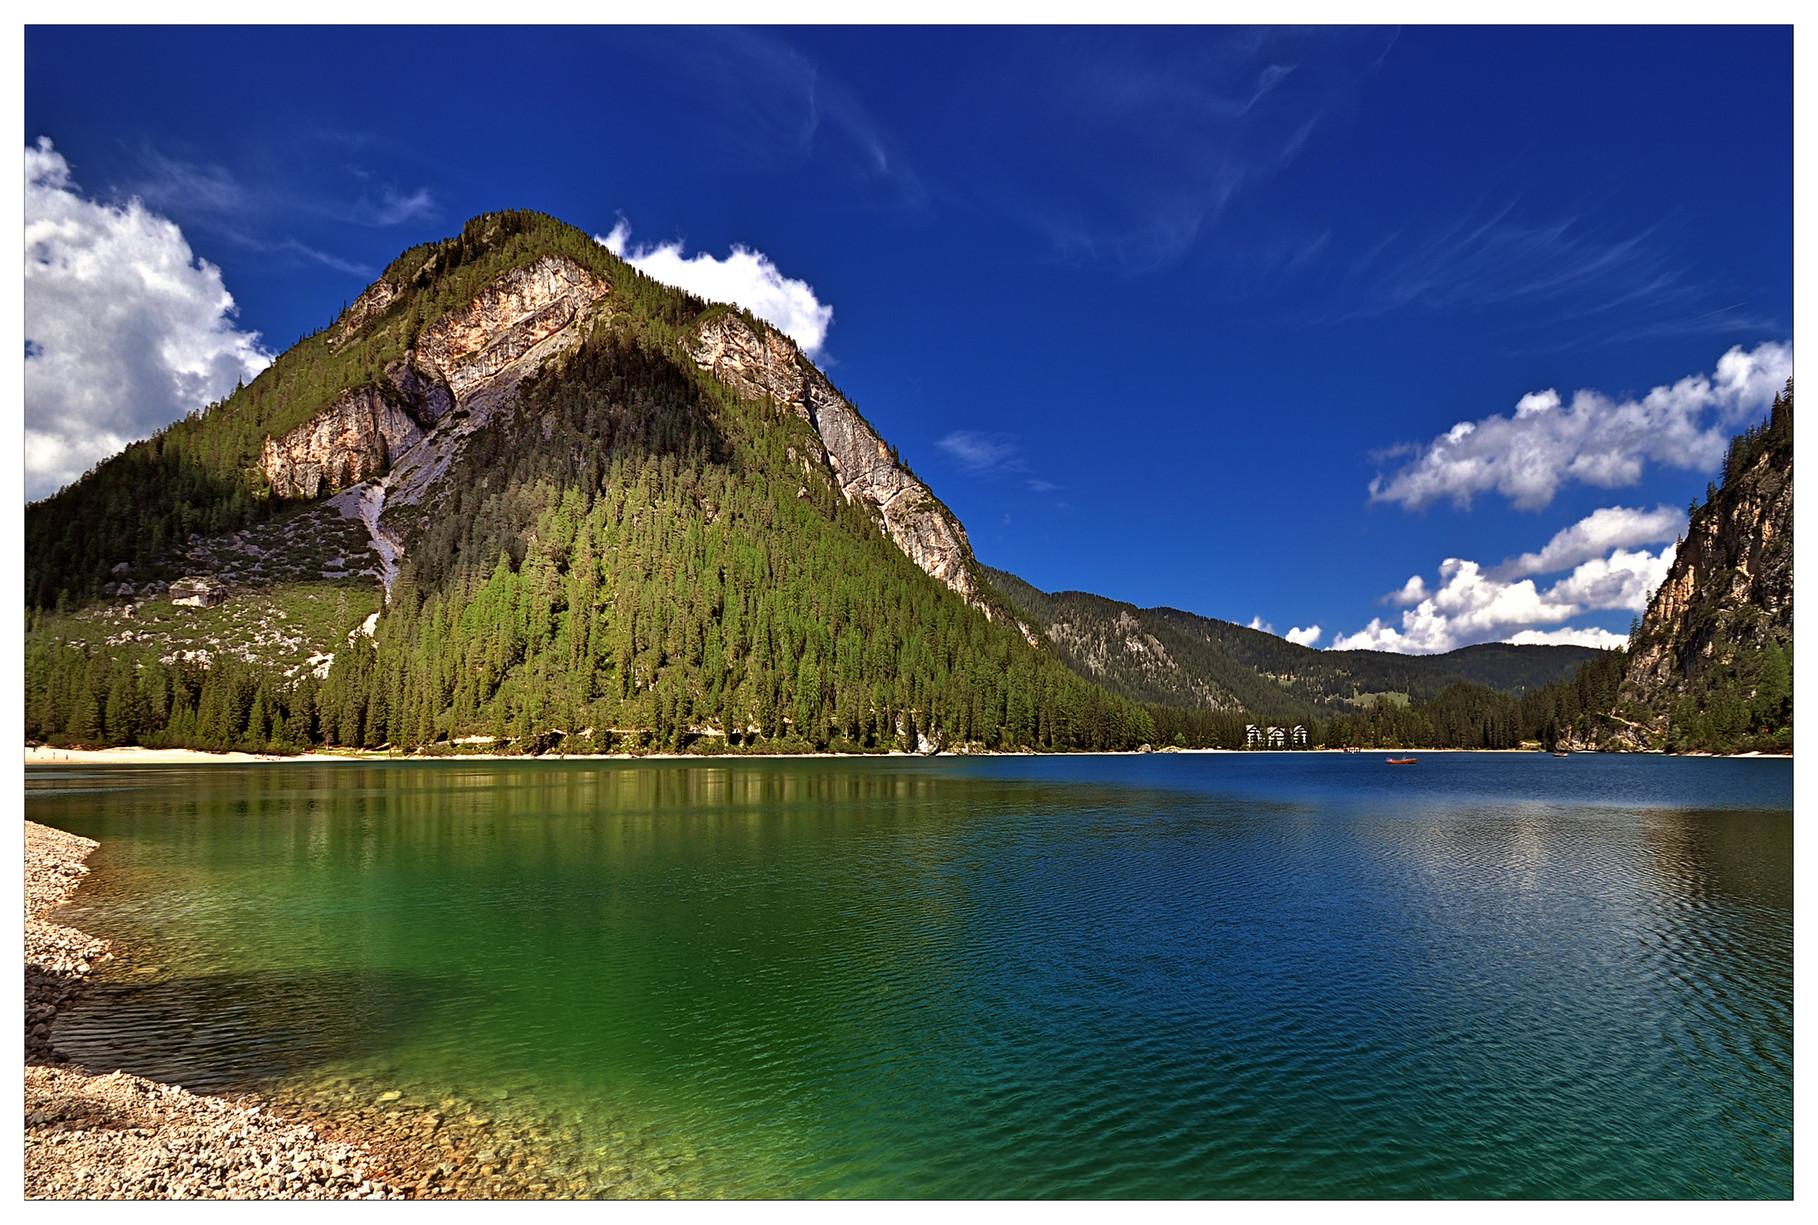 Pragser Wildsee